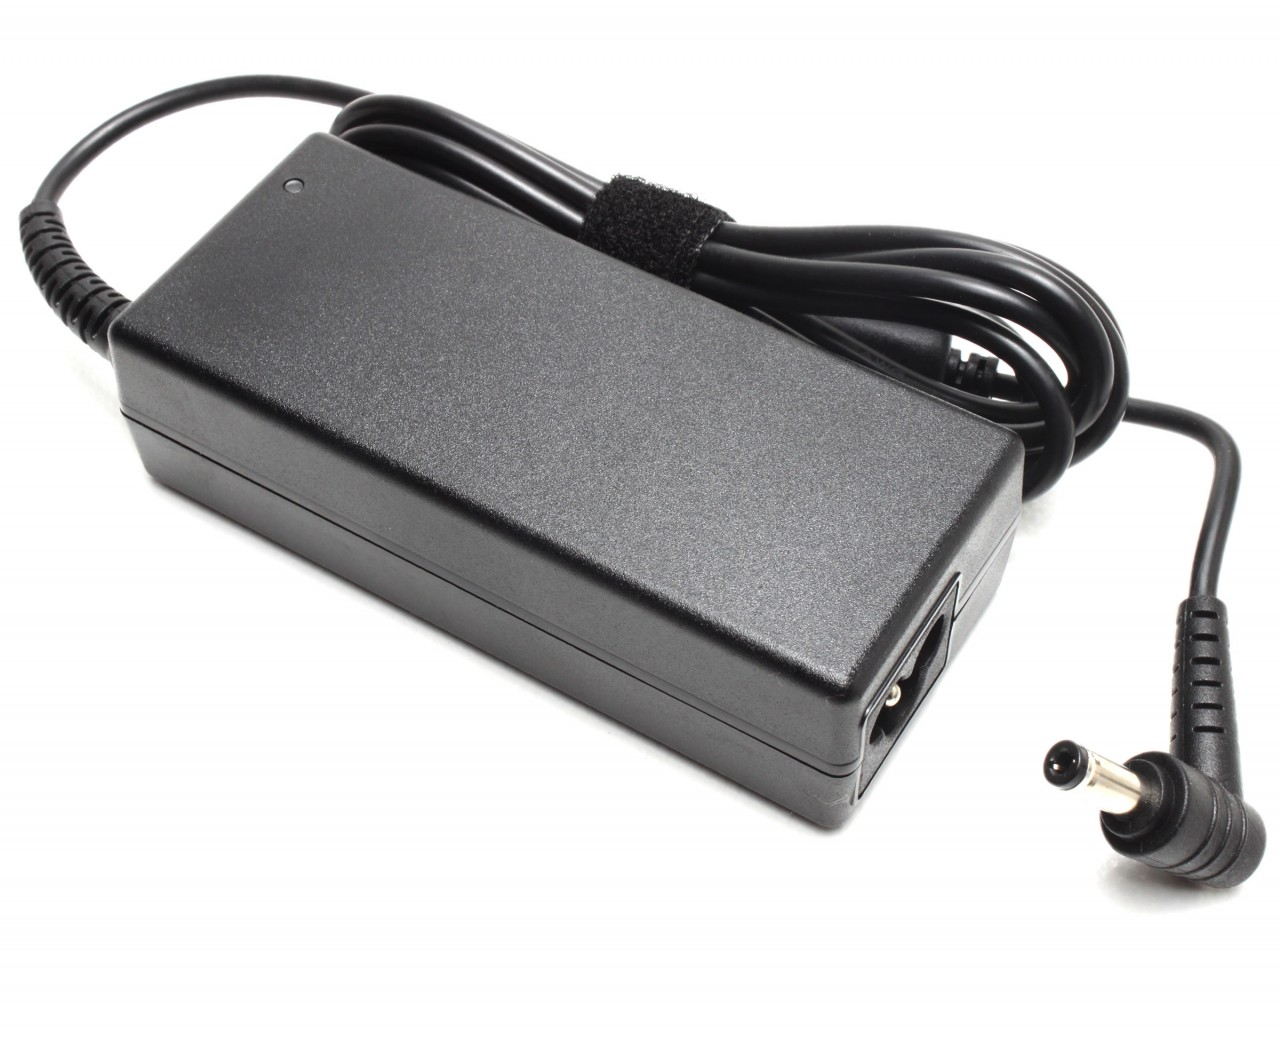 Incarcator Advent QT5500 imagine powerlaptop.ro 2021